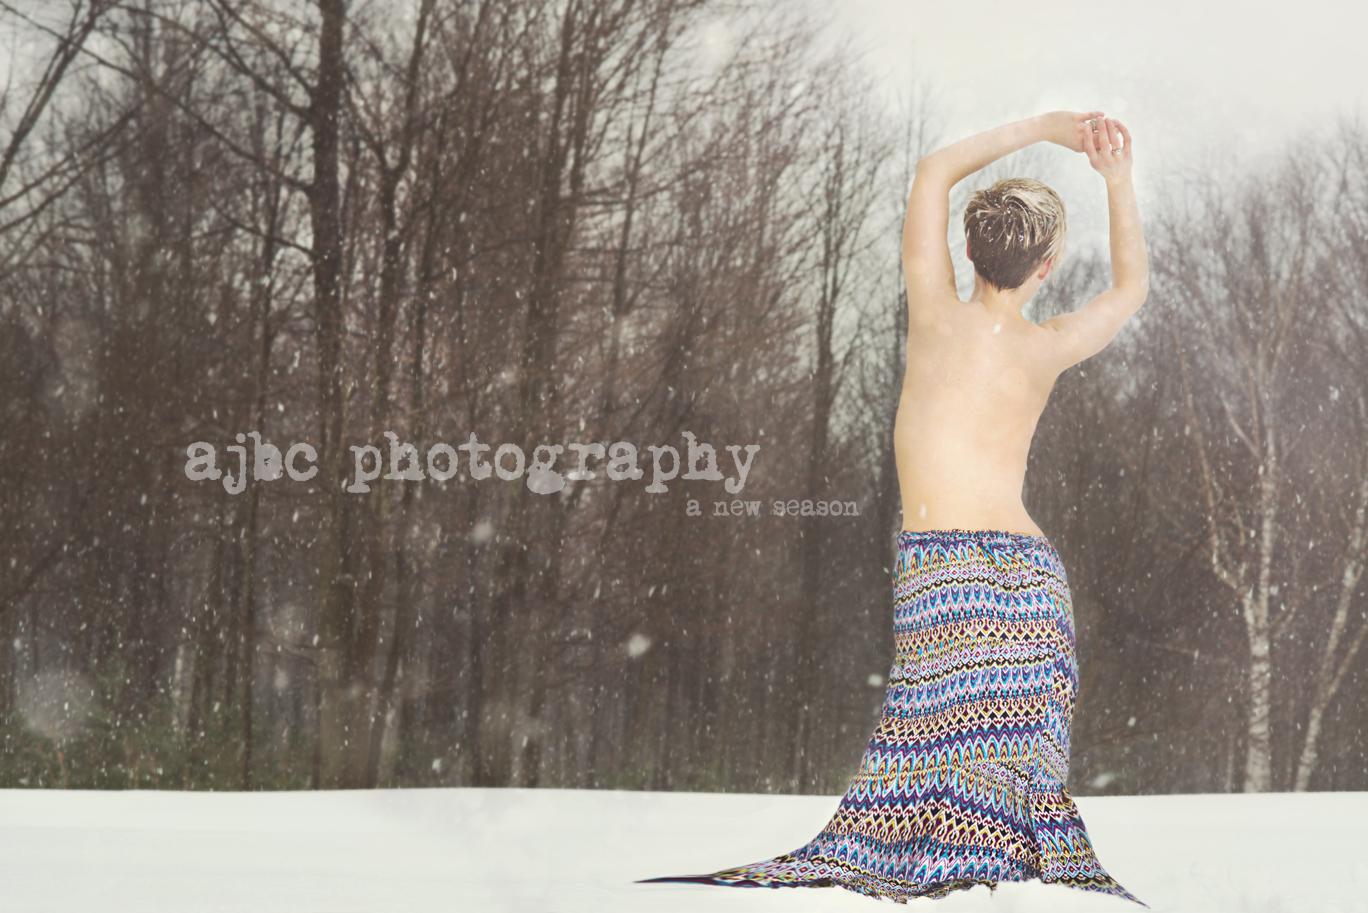 AJBCPhotography_PortHuron_MI_creative_portrait